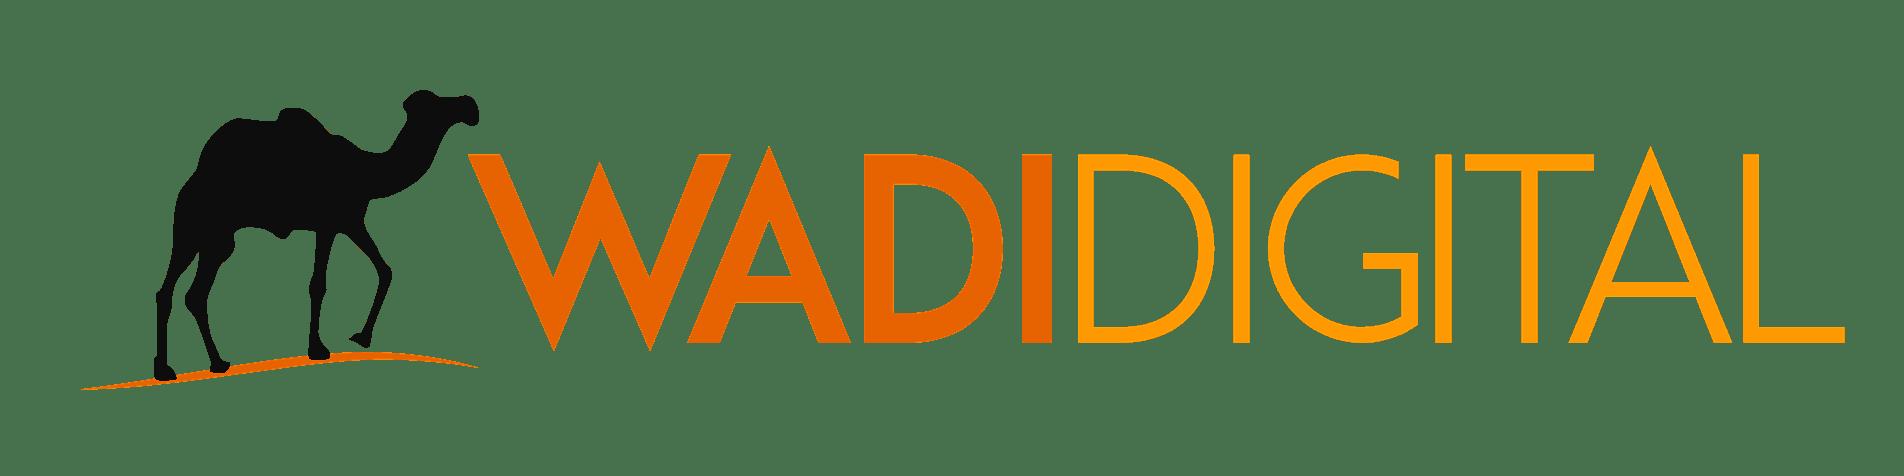 wadidigital-logo